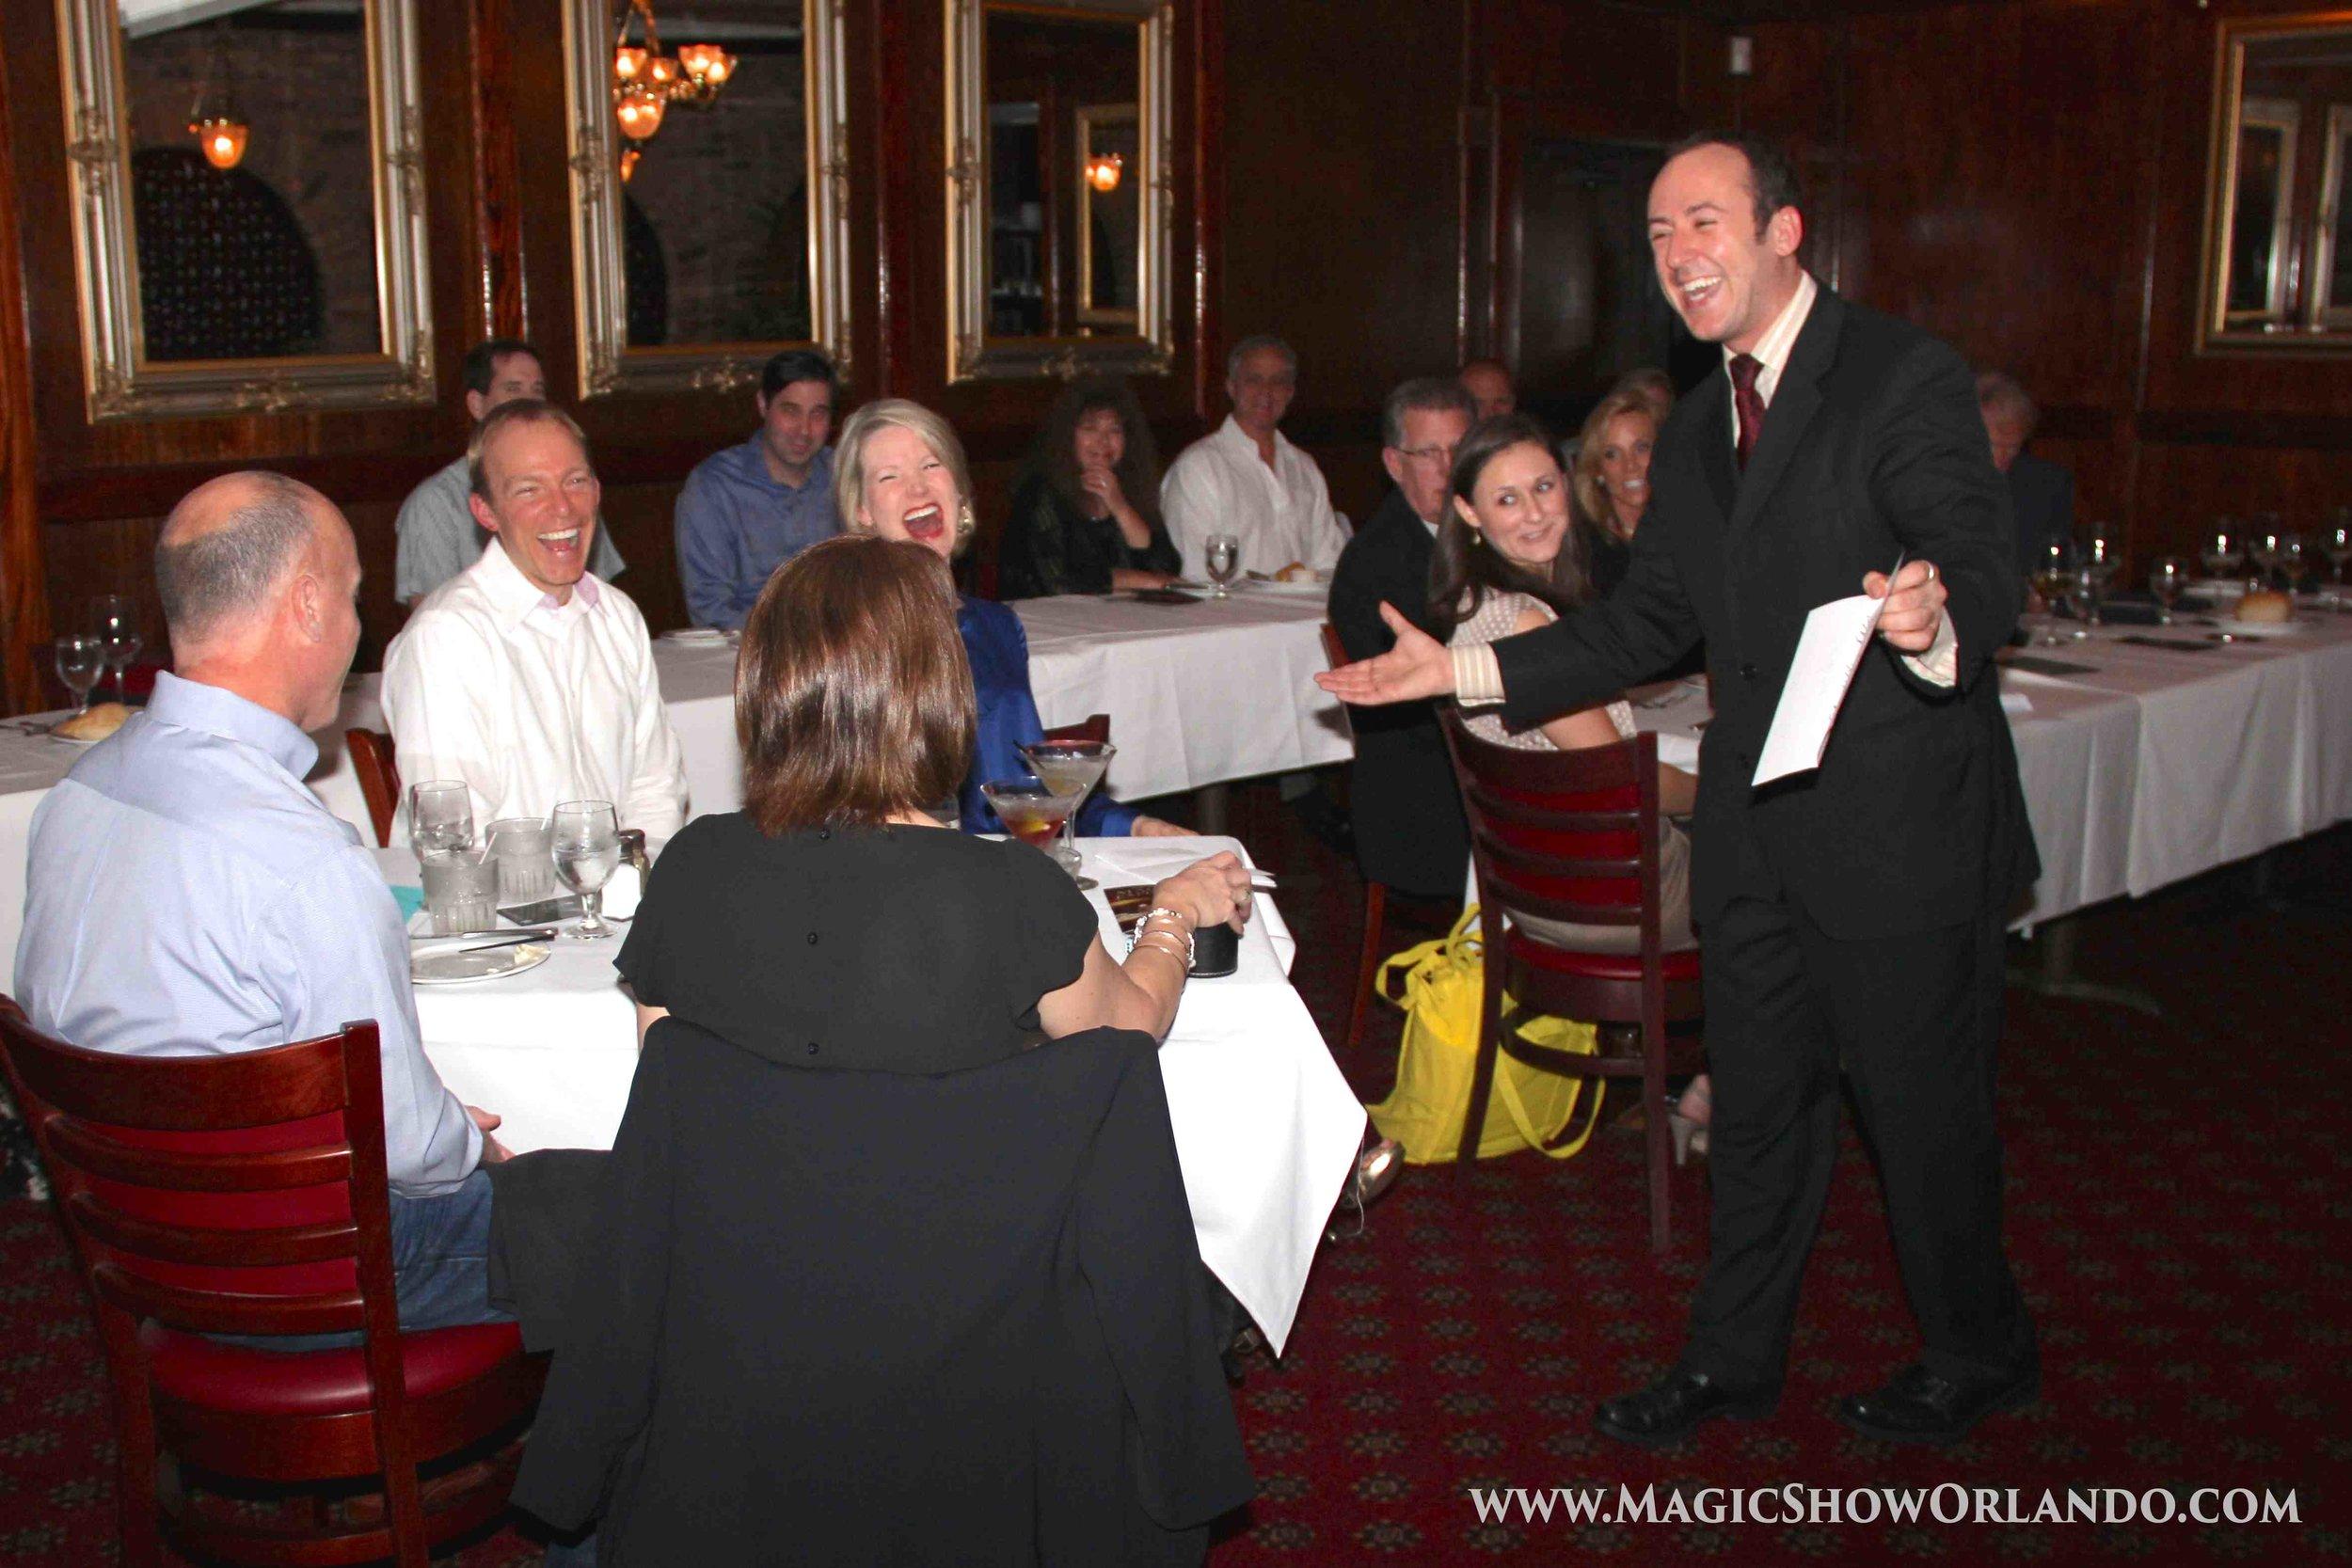 Orlando Magician Kostya Kimlat performs a magic dinner show at Christern's